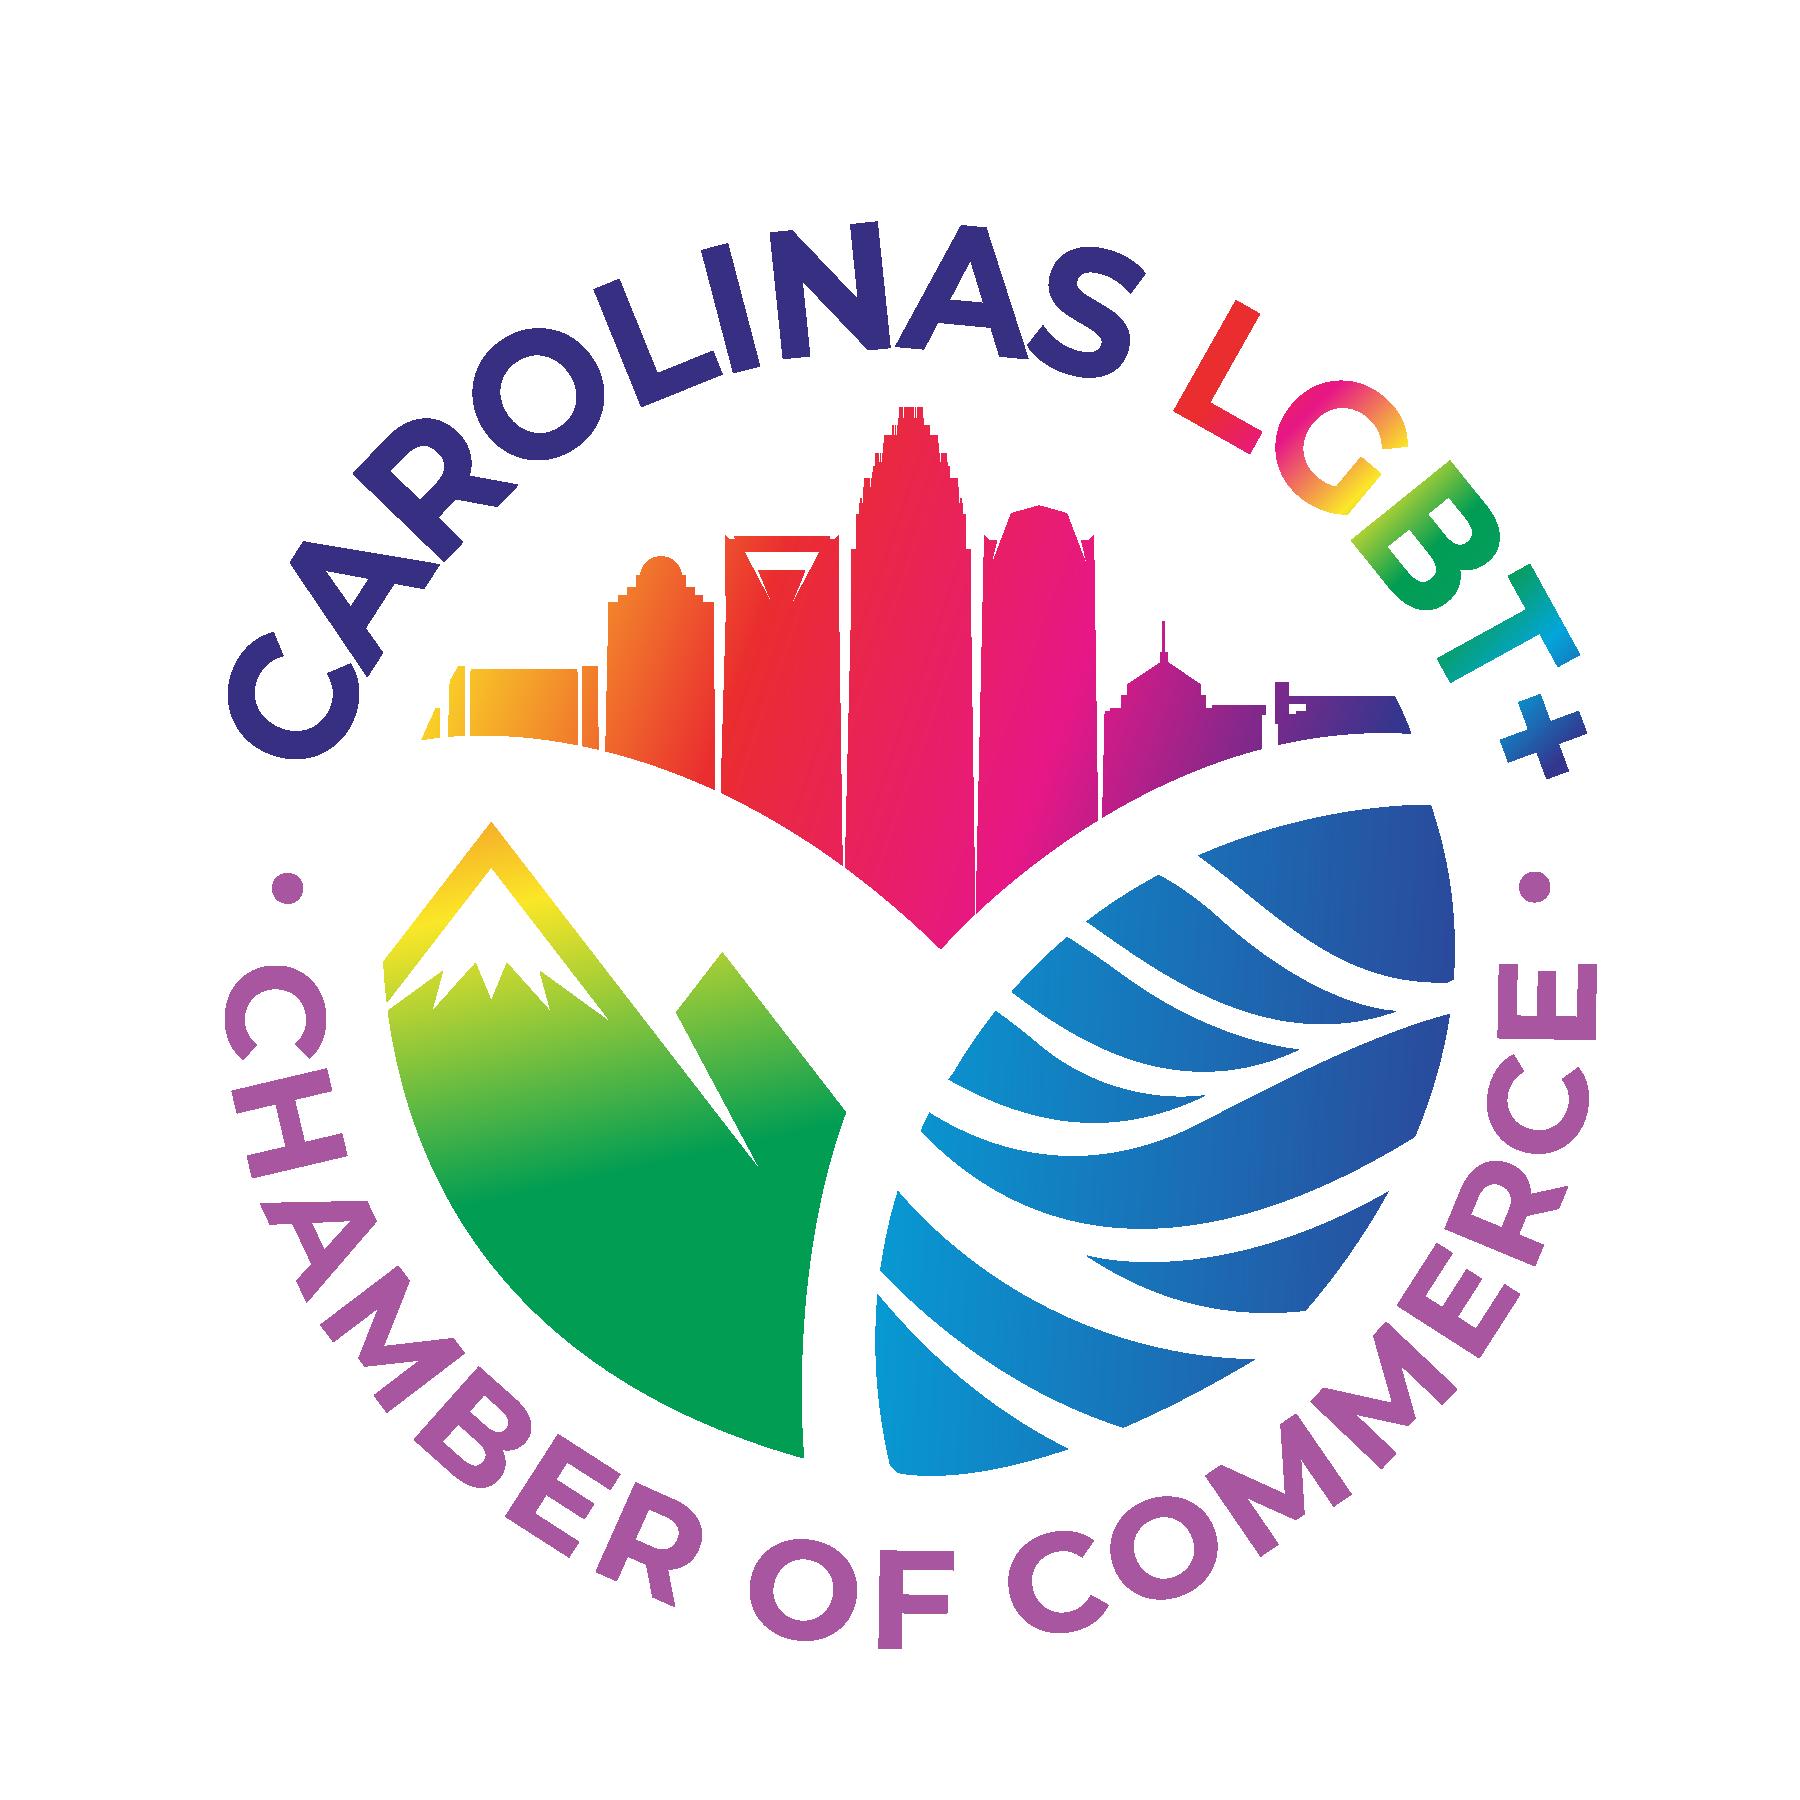 Carolinas LGBT_Circle Logo_final-01